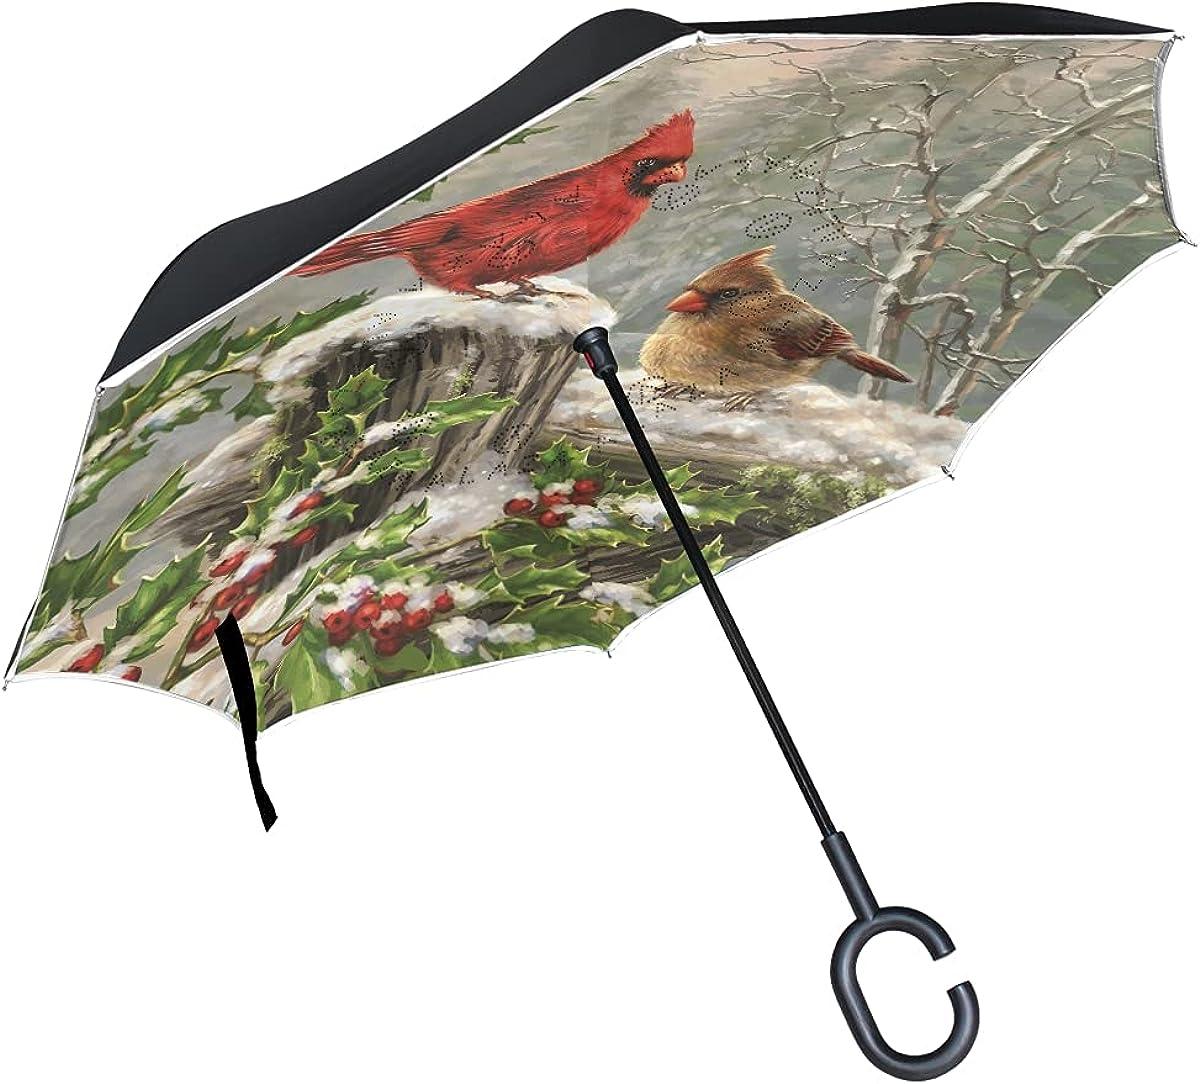 store New life Unicorn Reverse Umbrella Upside Down Foldin Handle C-Shaped with